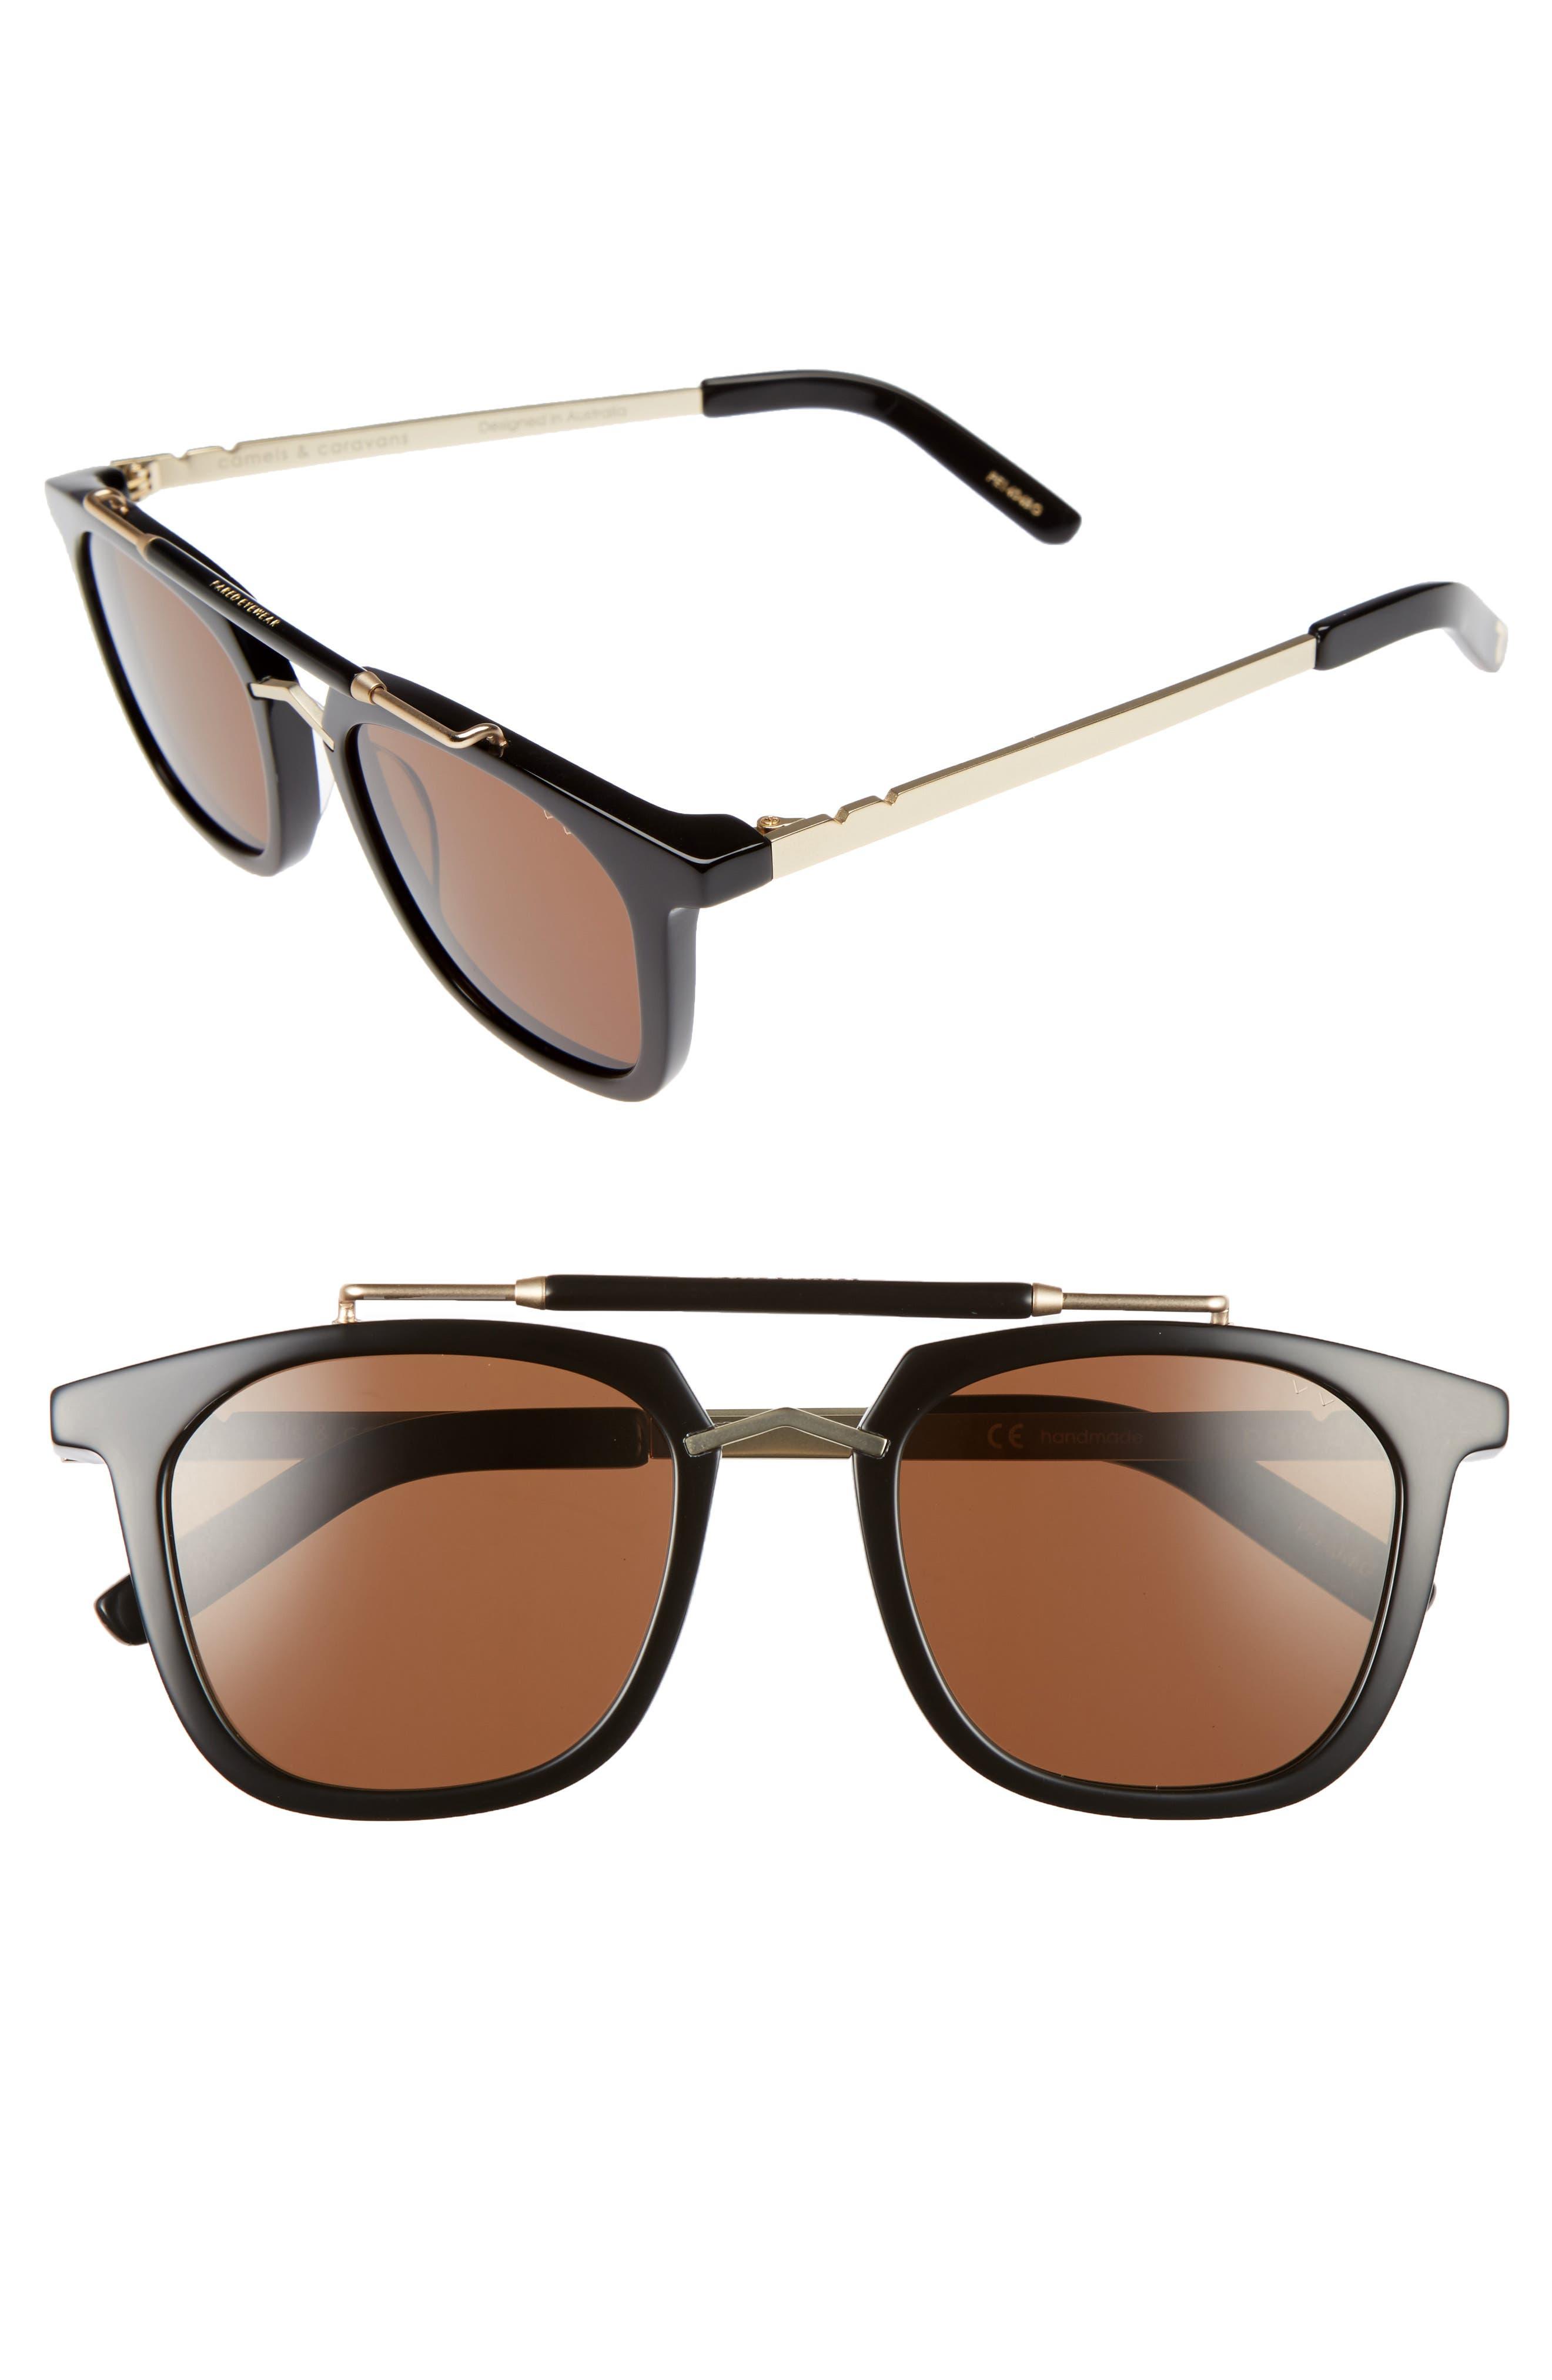 Camels & Caravans 50mm Retro Sunglasses,                             Main thumbnail 1, color,                             001